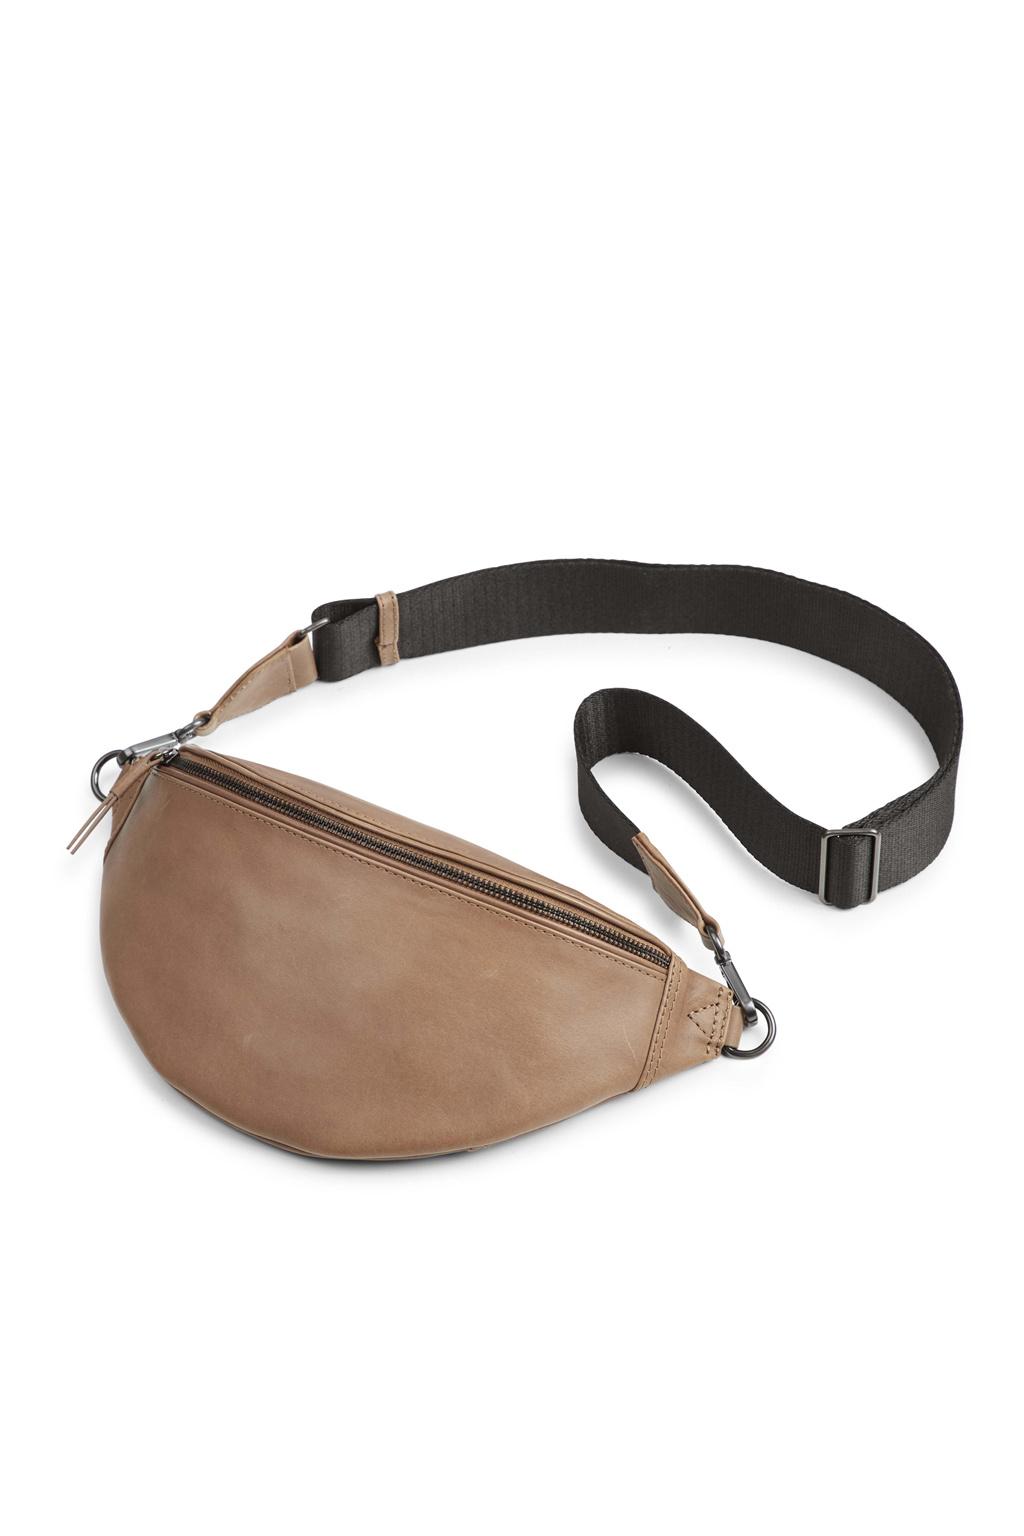 Elinor Bum Bag - Antique Caramel w/ Black-1